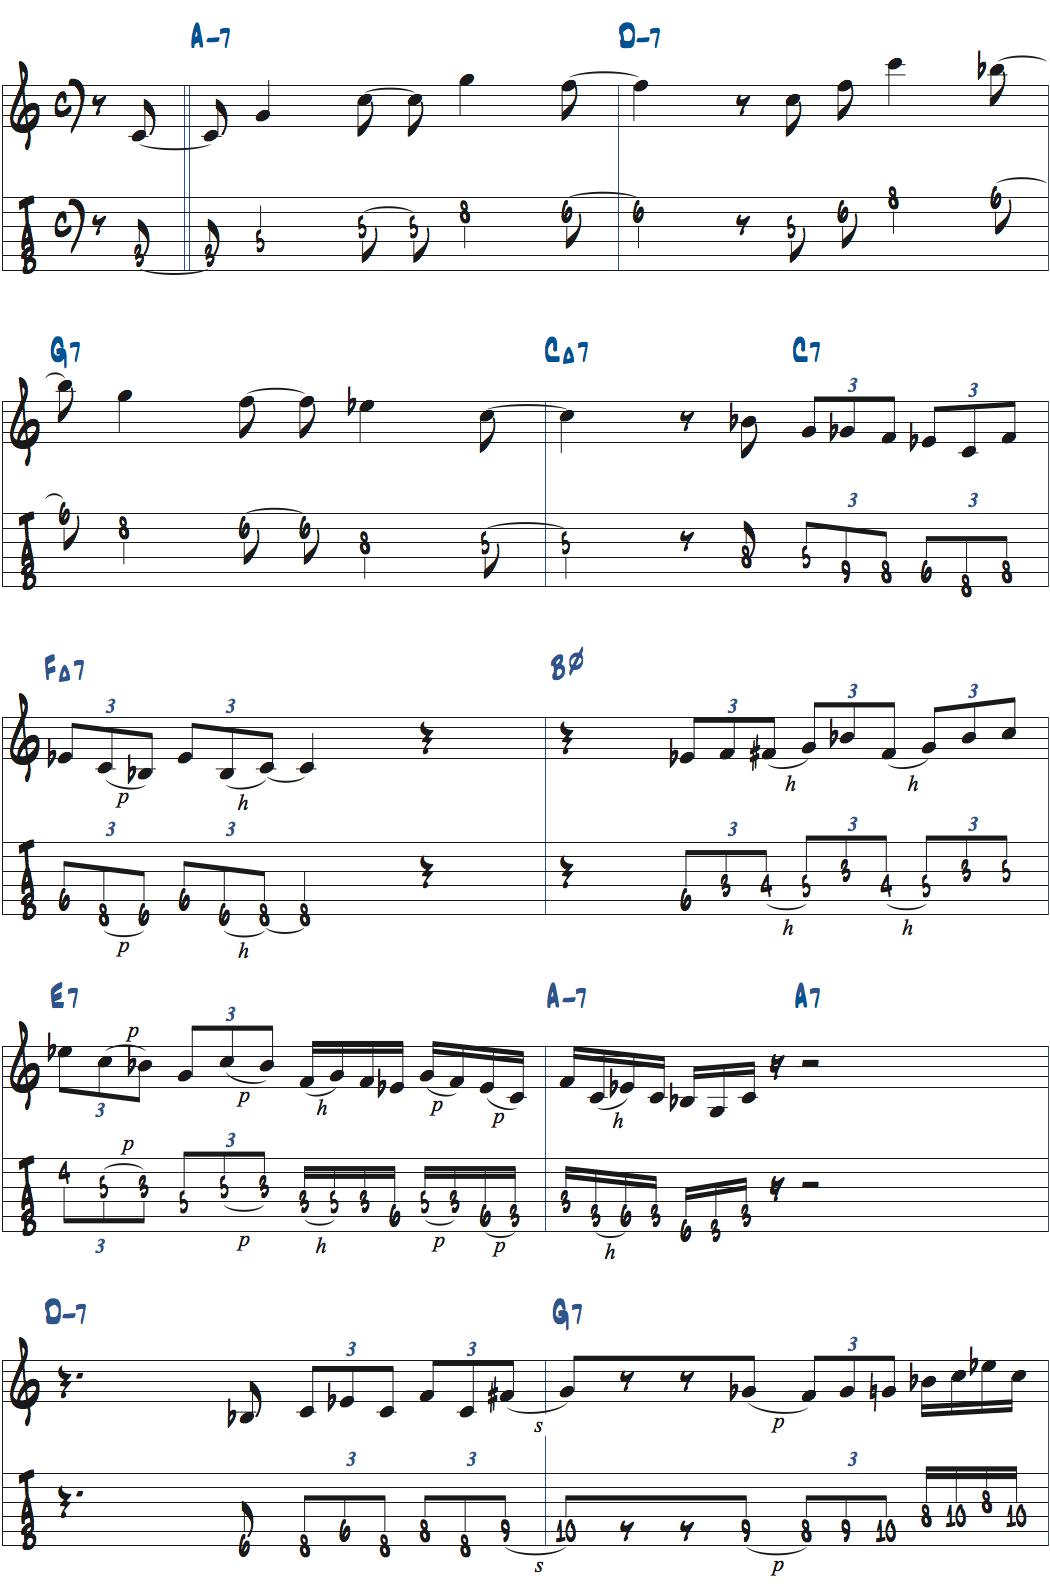 Cブルーススケールを使ったアドリブ例1ページ1楽譜